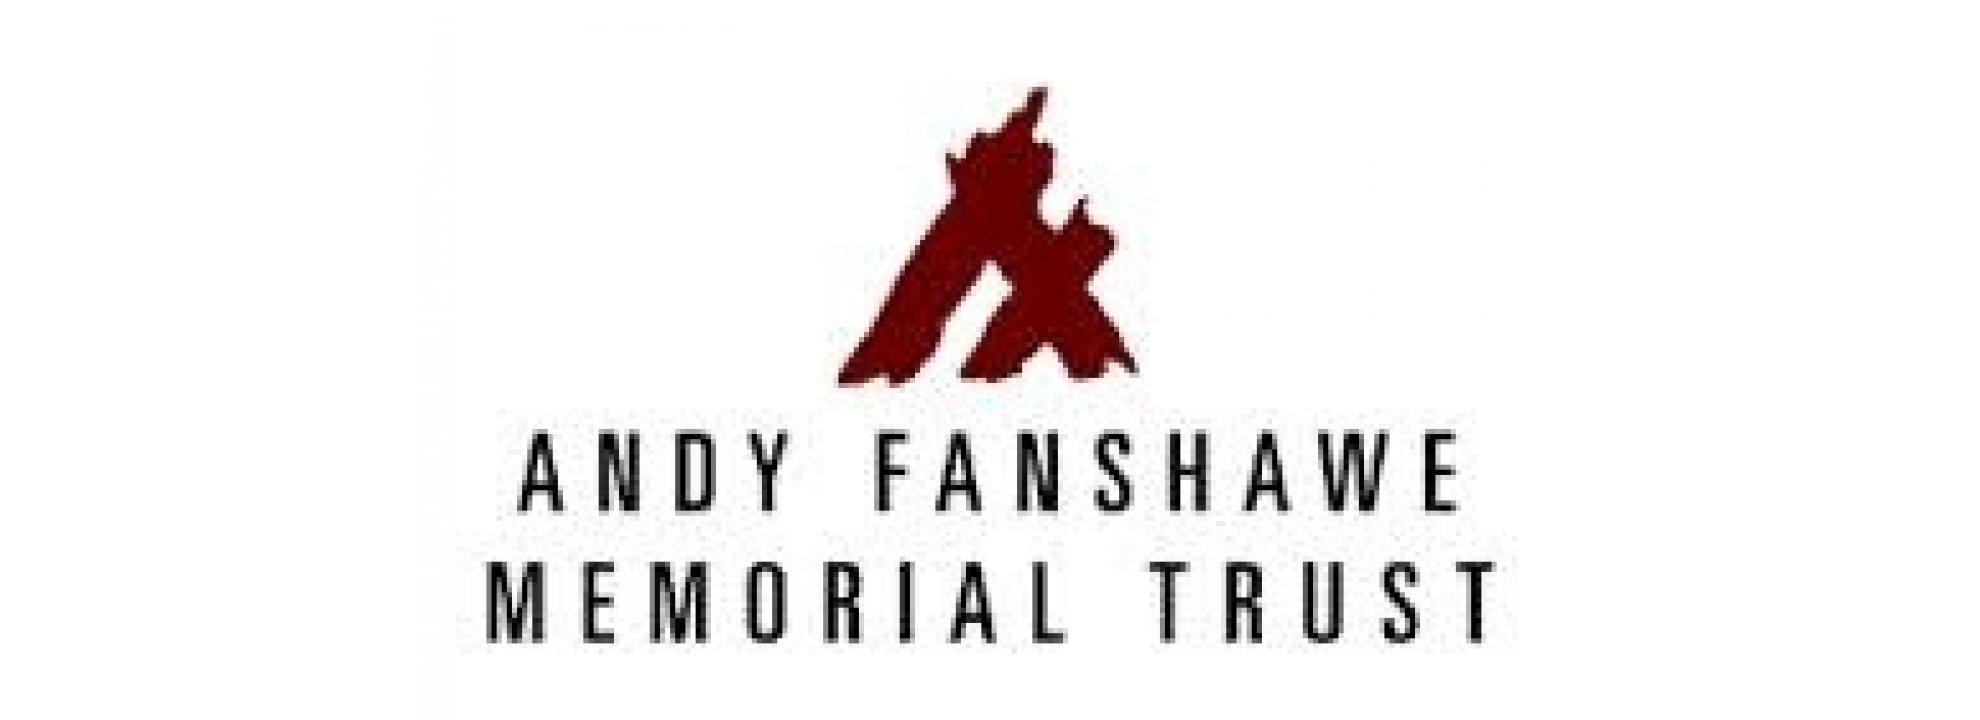 Andy Fanshawe Memorial Trust Banner